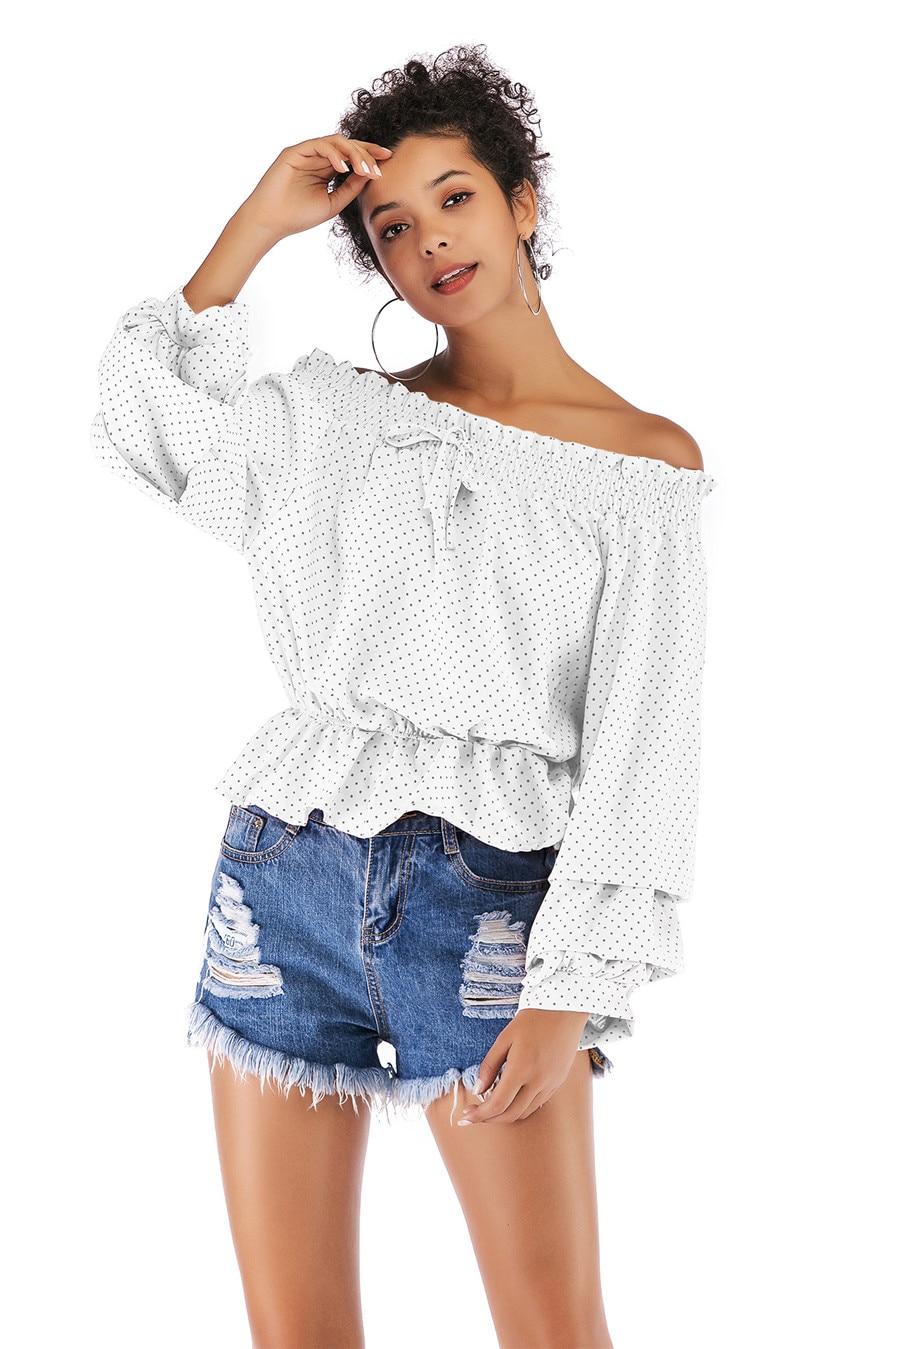 Gladiolus Chiffon Blouse Women 2019 Spring Autumn Long Sleeve Polka Dot Off Shoulder Sexy Blouses Women Shirts Ruffles Blusas (22)